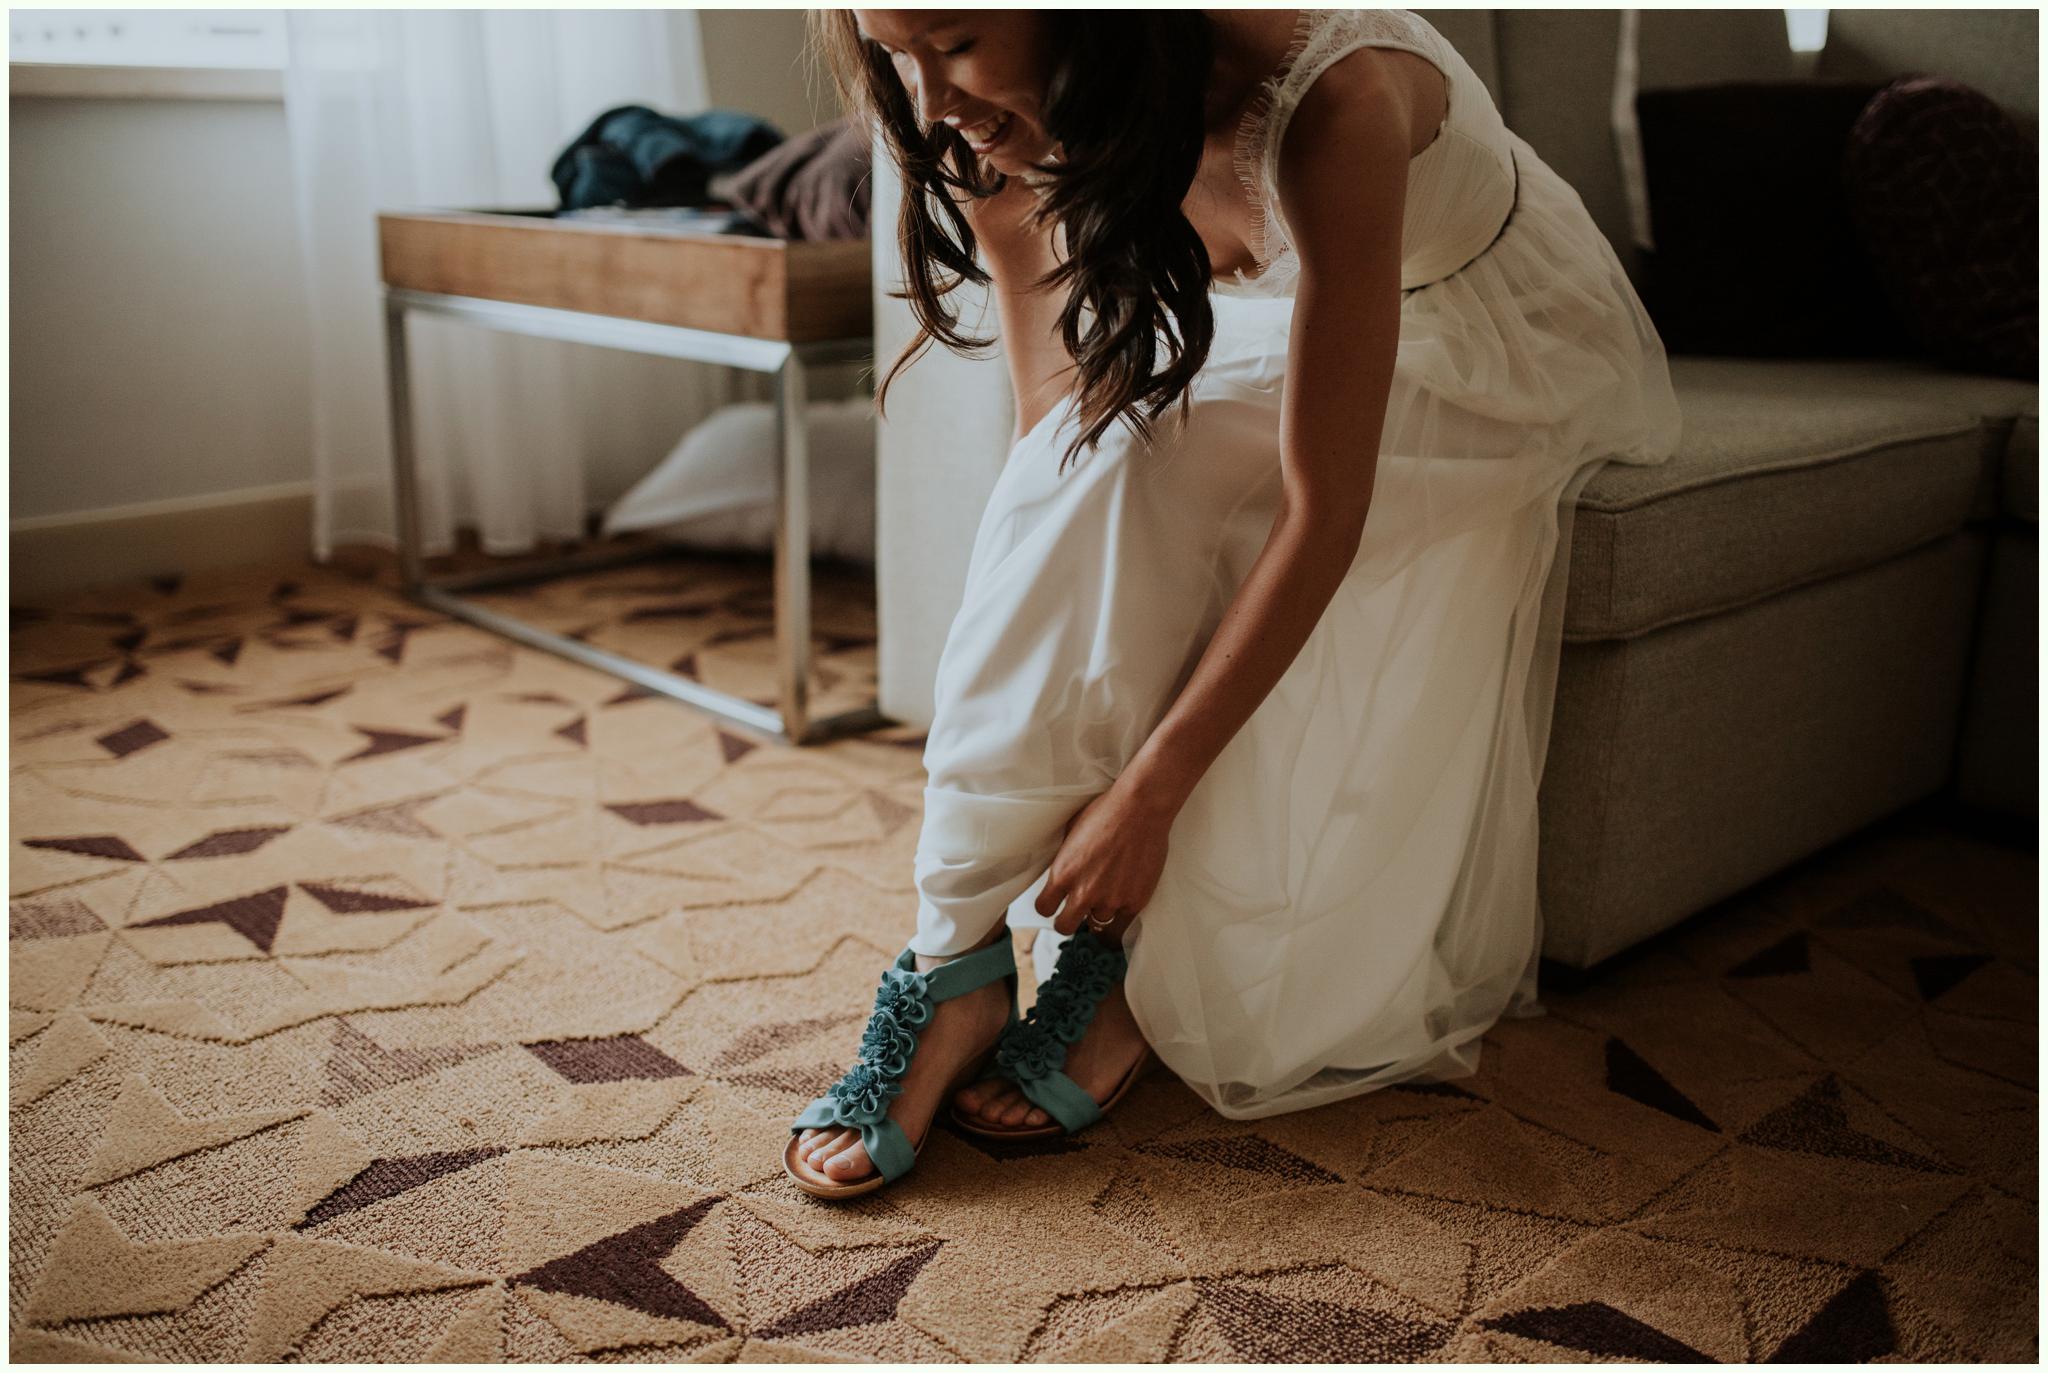 within-sodo-june-wedding-seattle-photographer-caitlyn-nikula-28.jpg